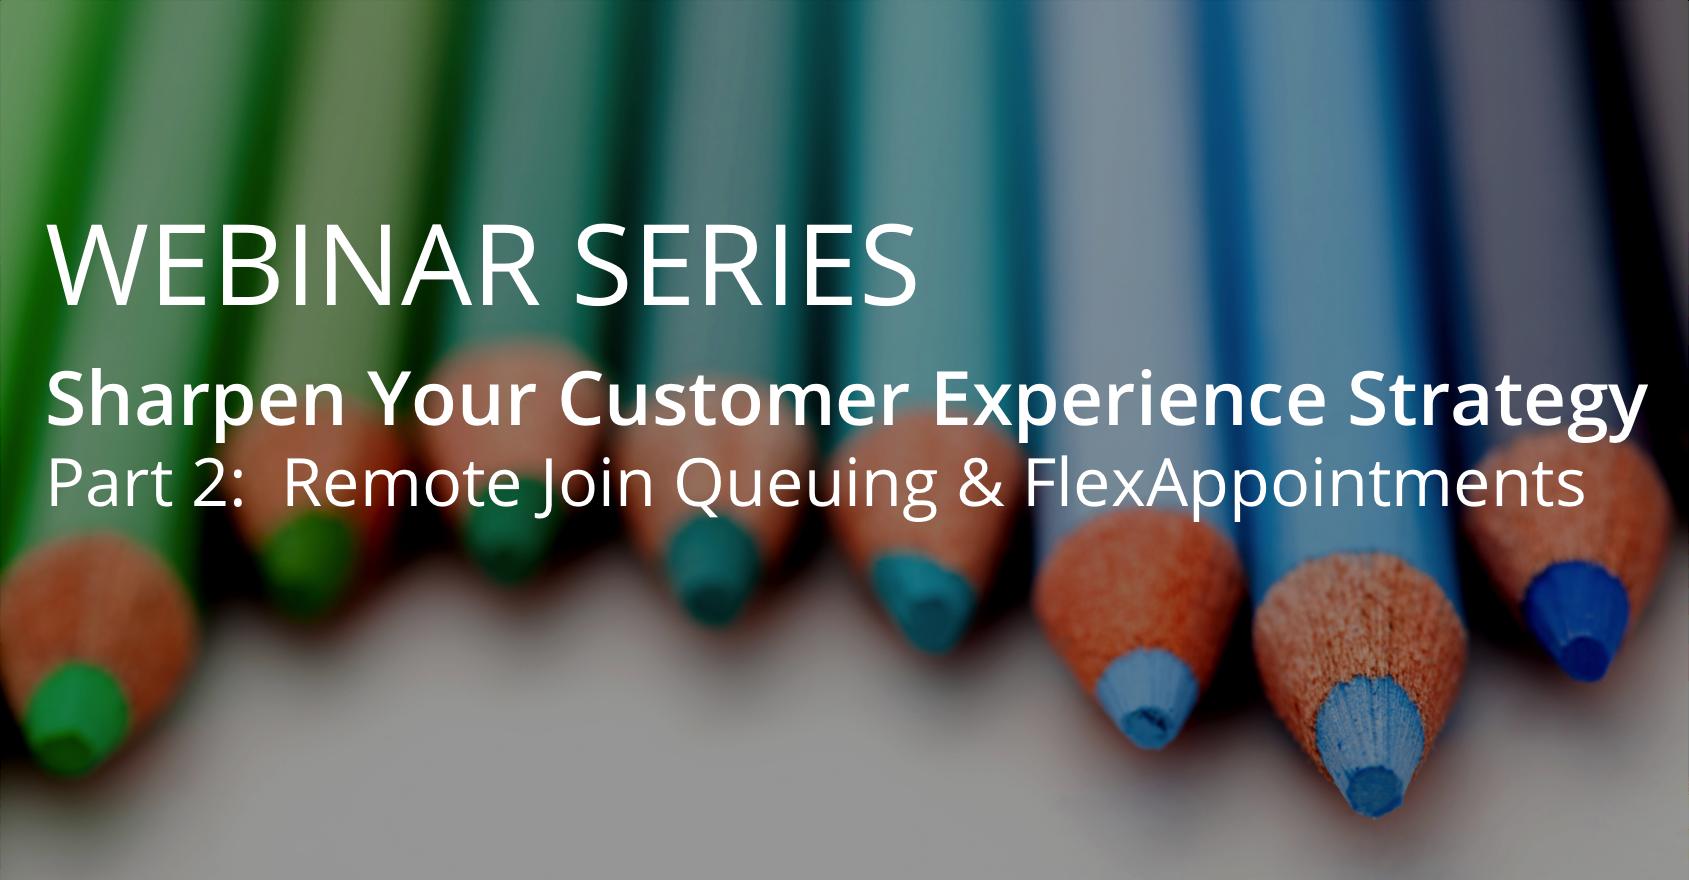 Sharpen Your CX Strategy - Part 2 - blog banner